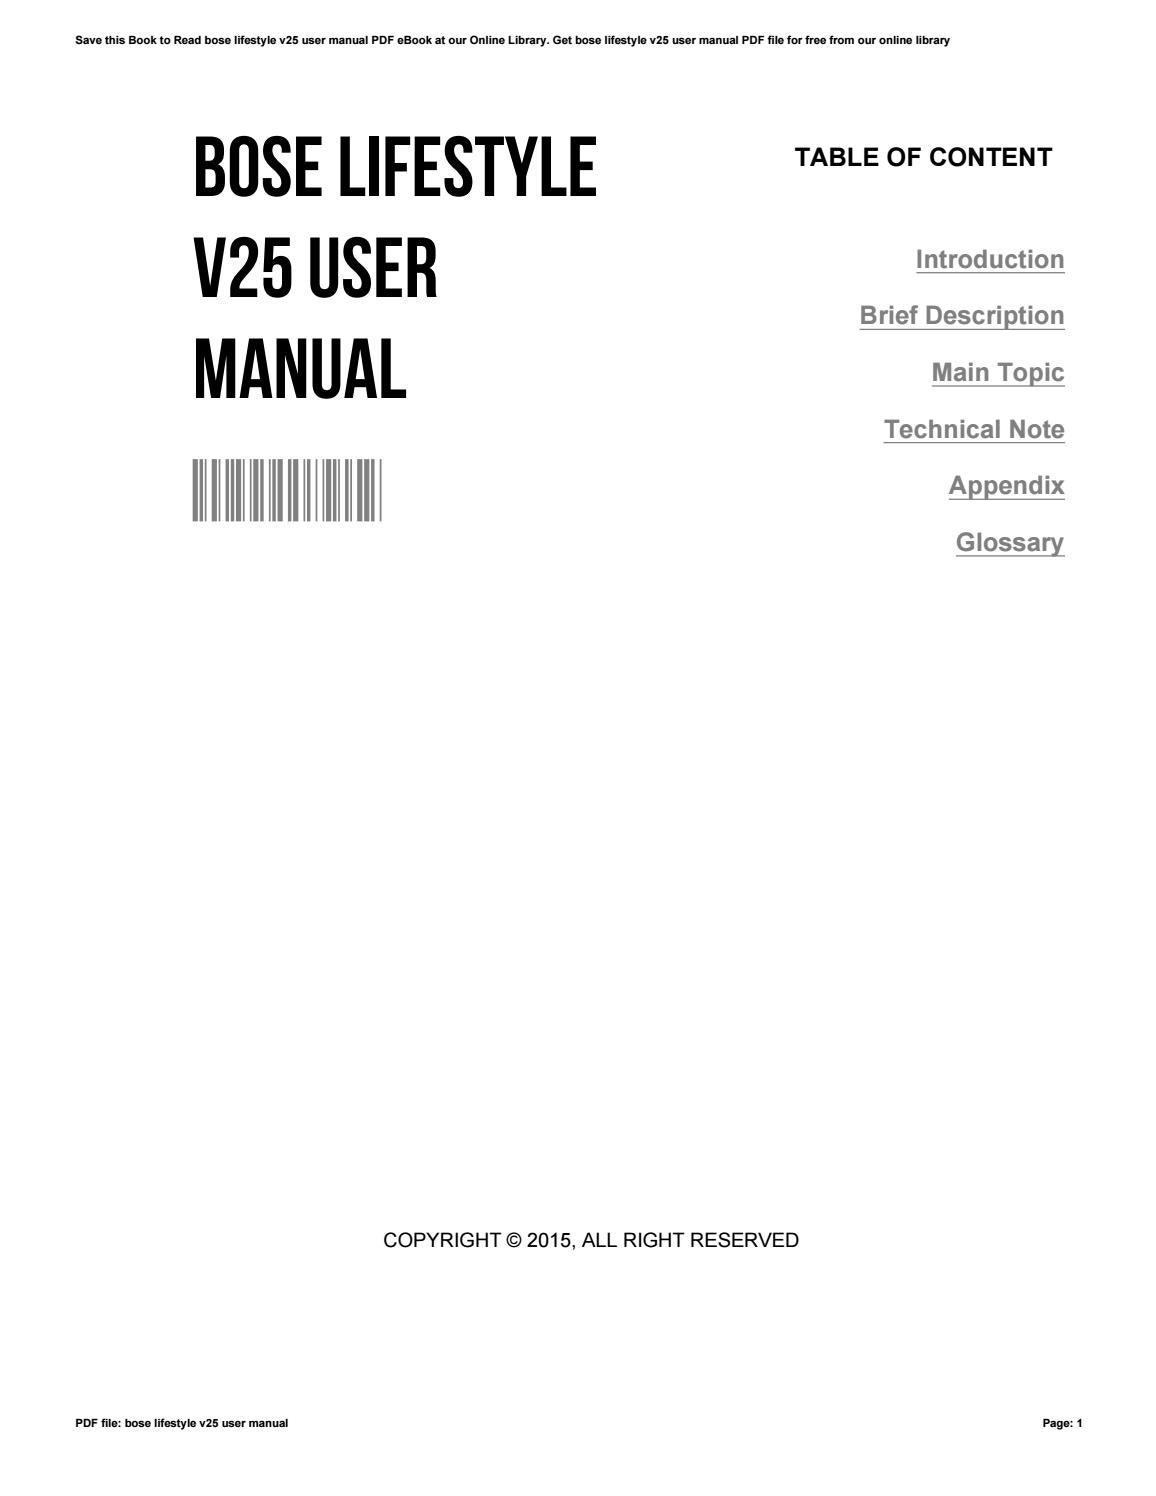 Bose lifestyle v25 manual download.